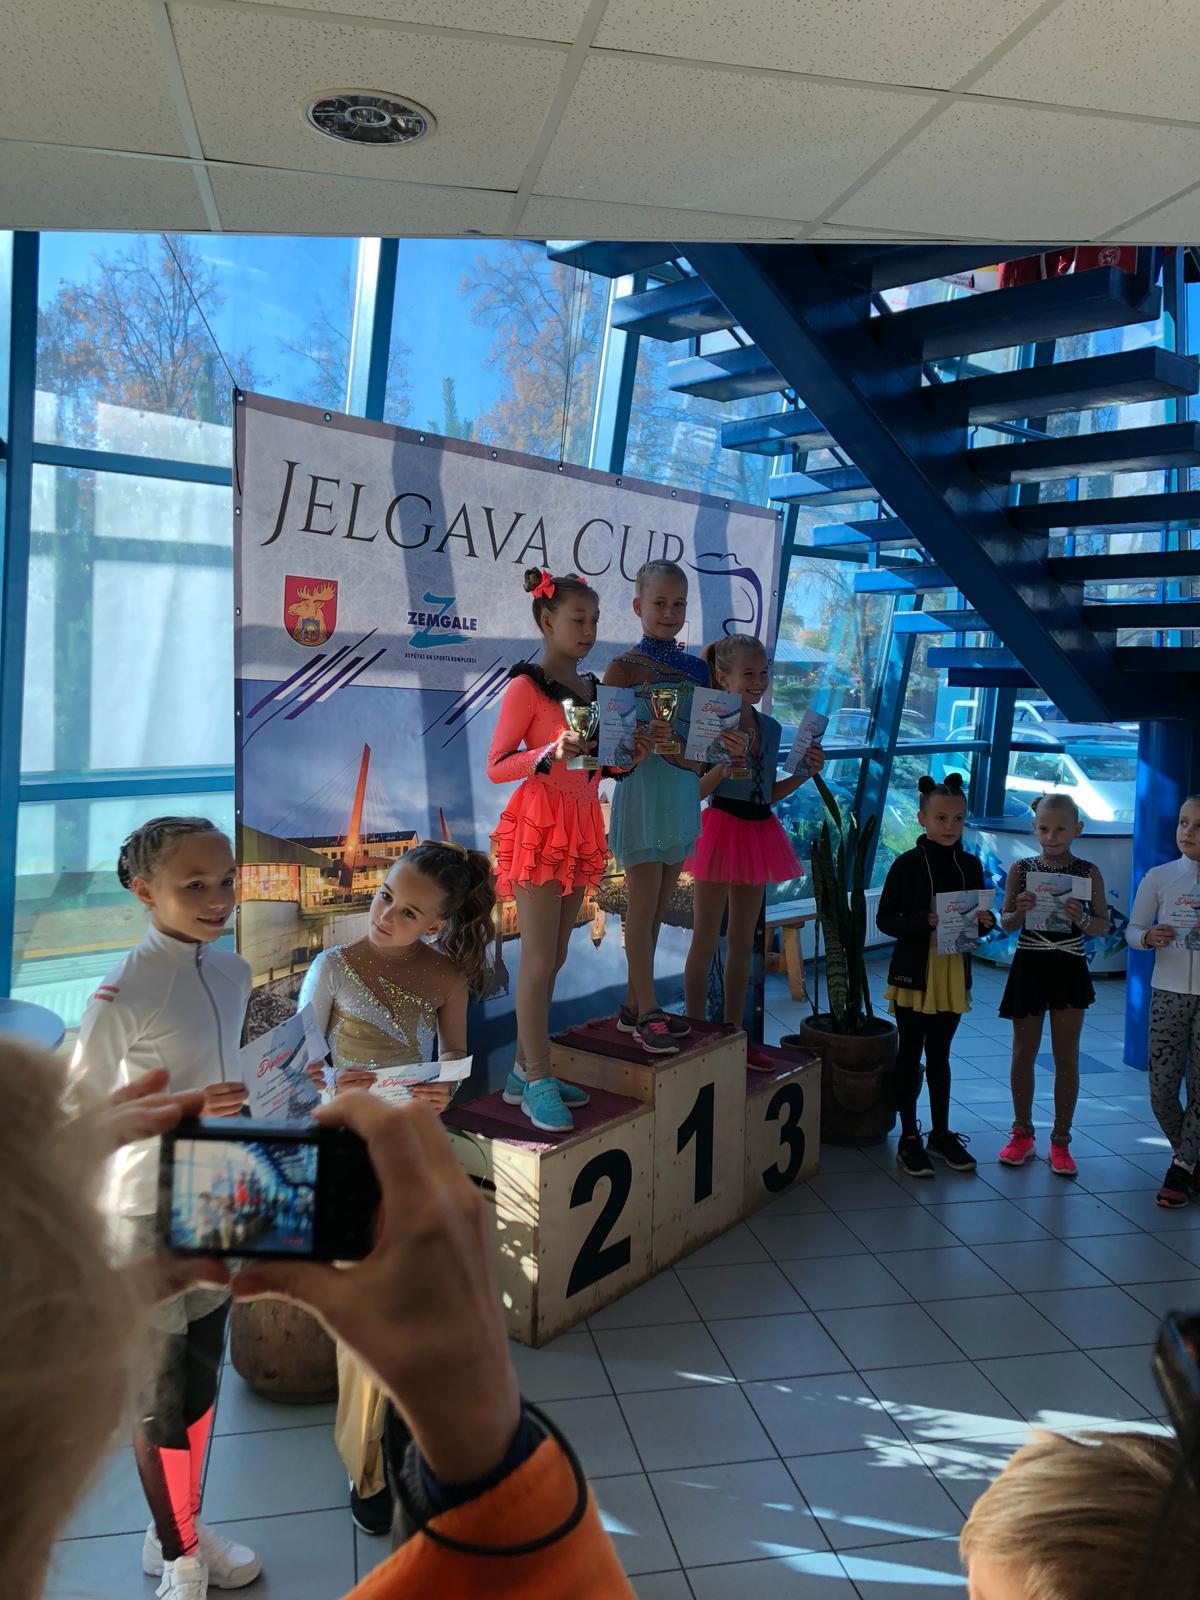 Jelgava cup 2018 kausa izcīņa OZO klubs